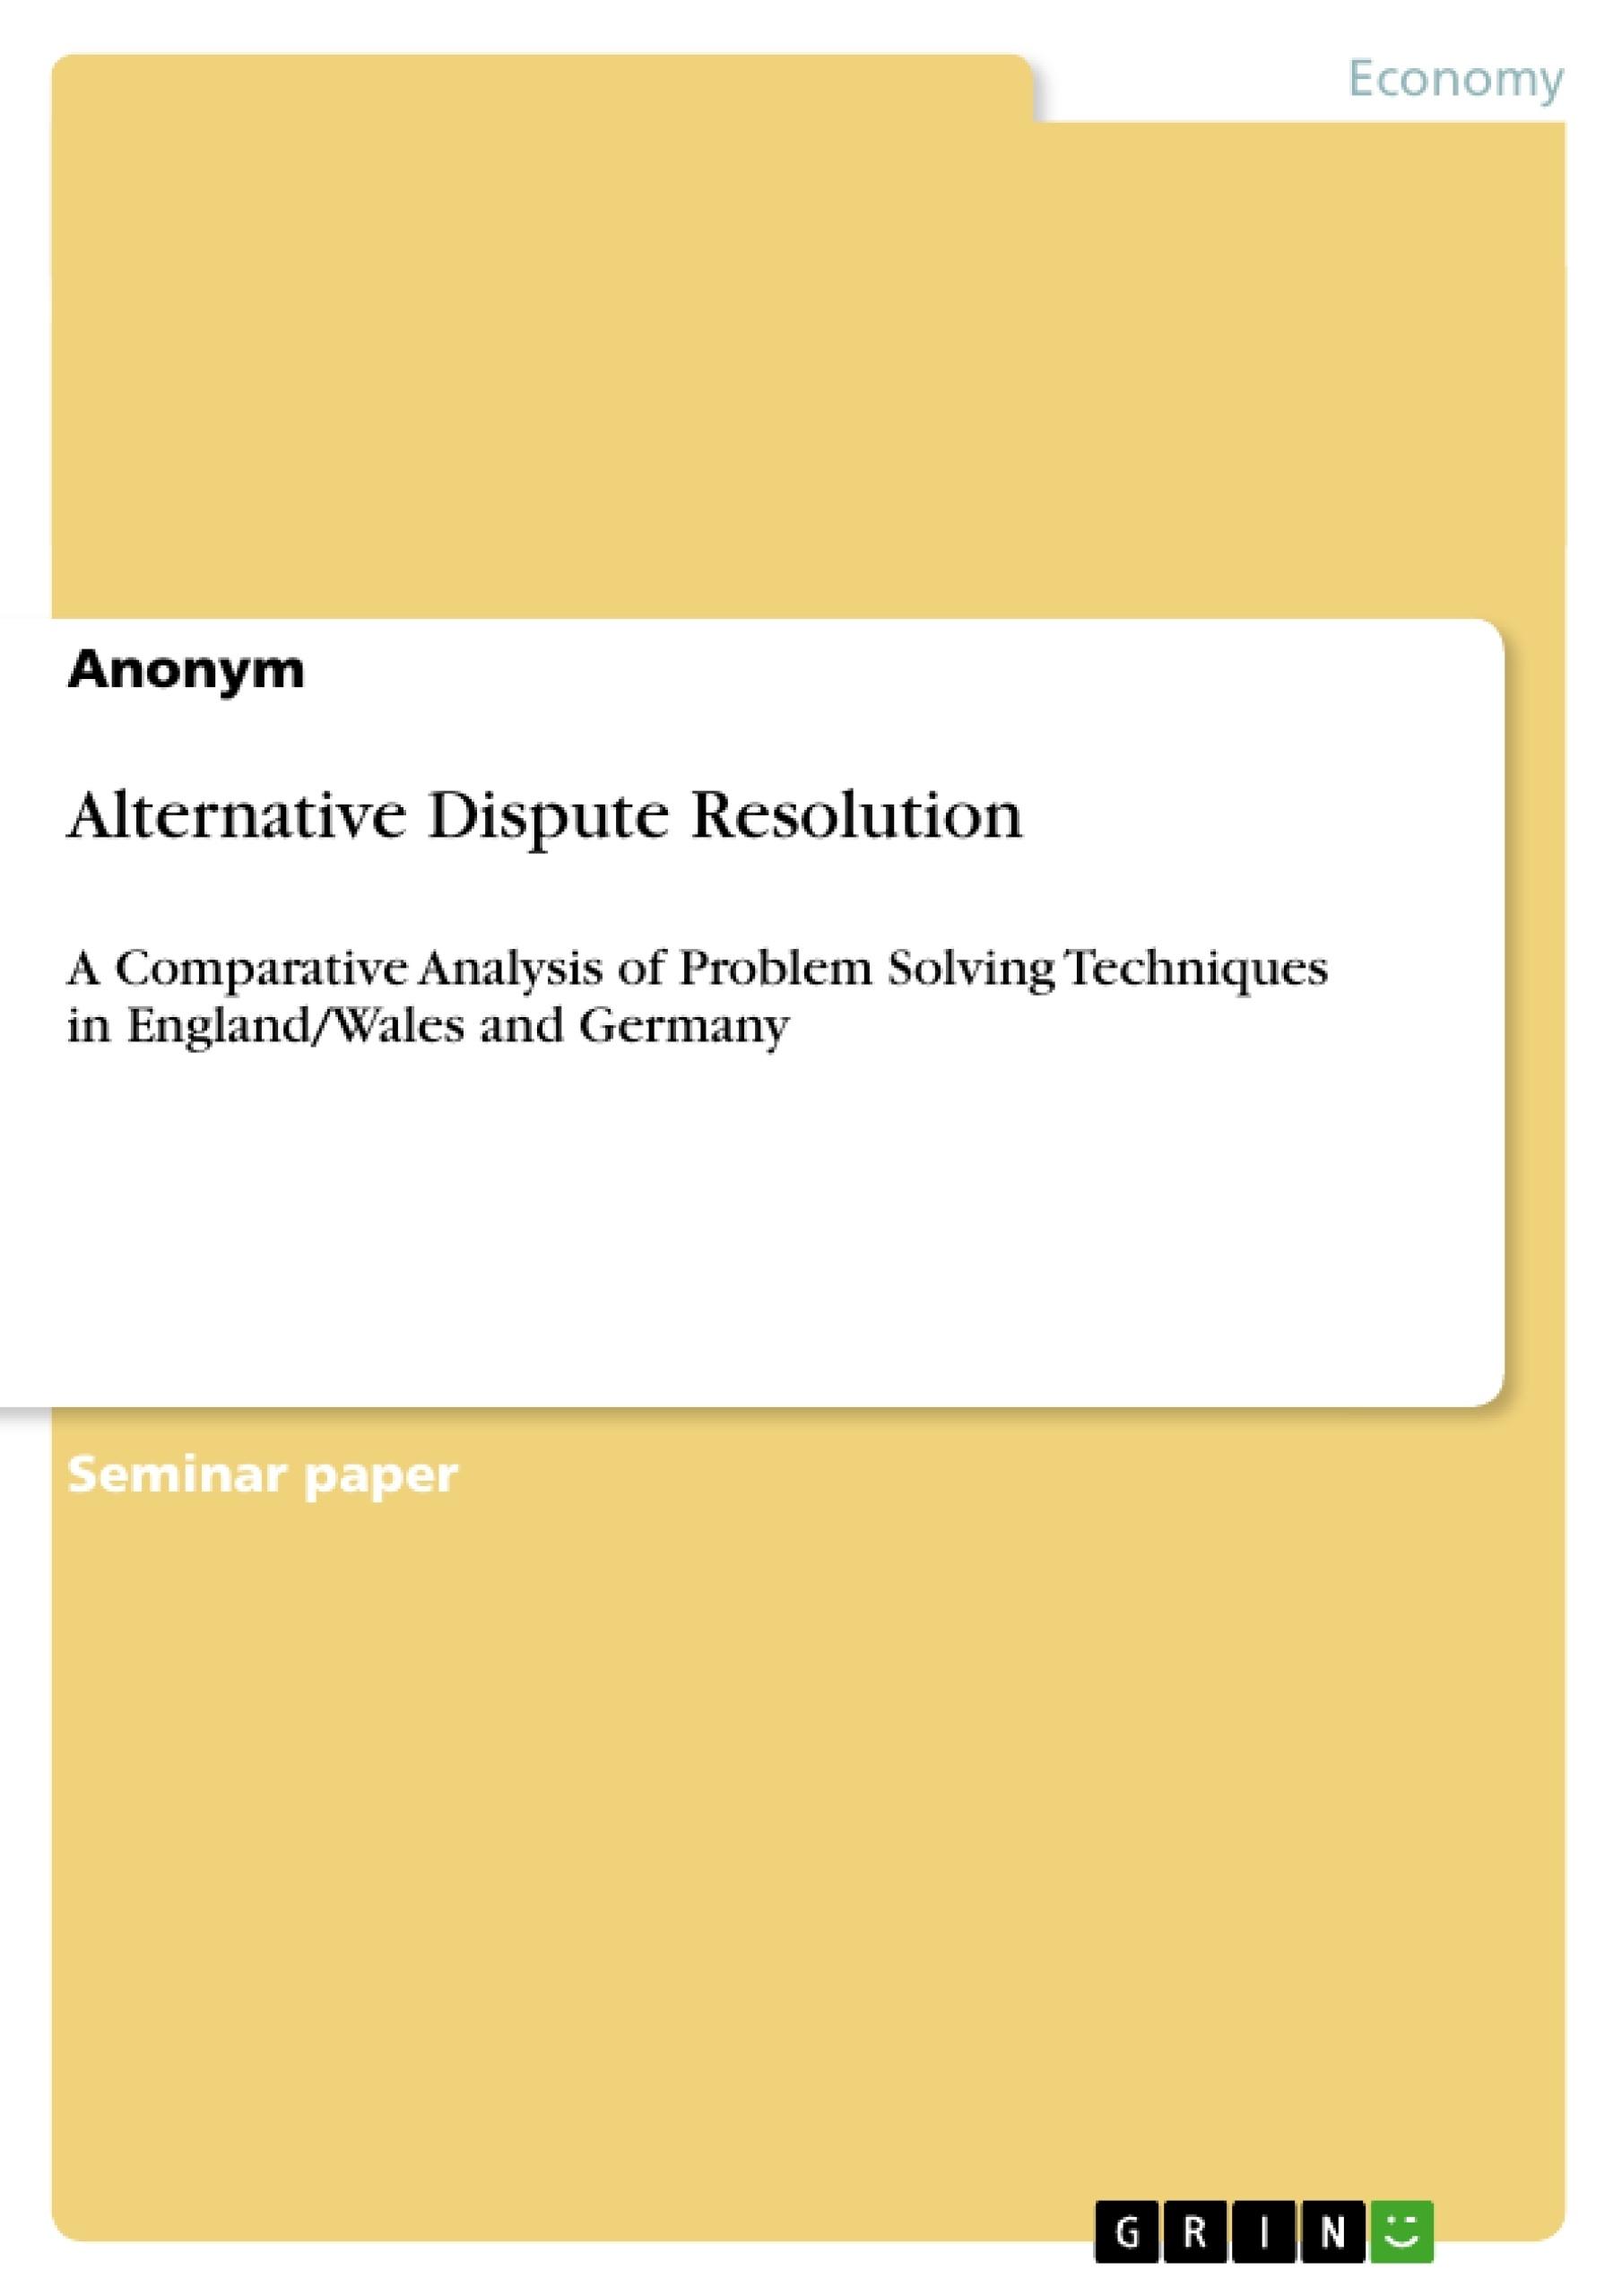 Title: Alternative Dispute Resolution